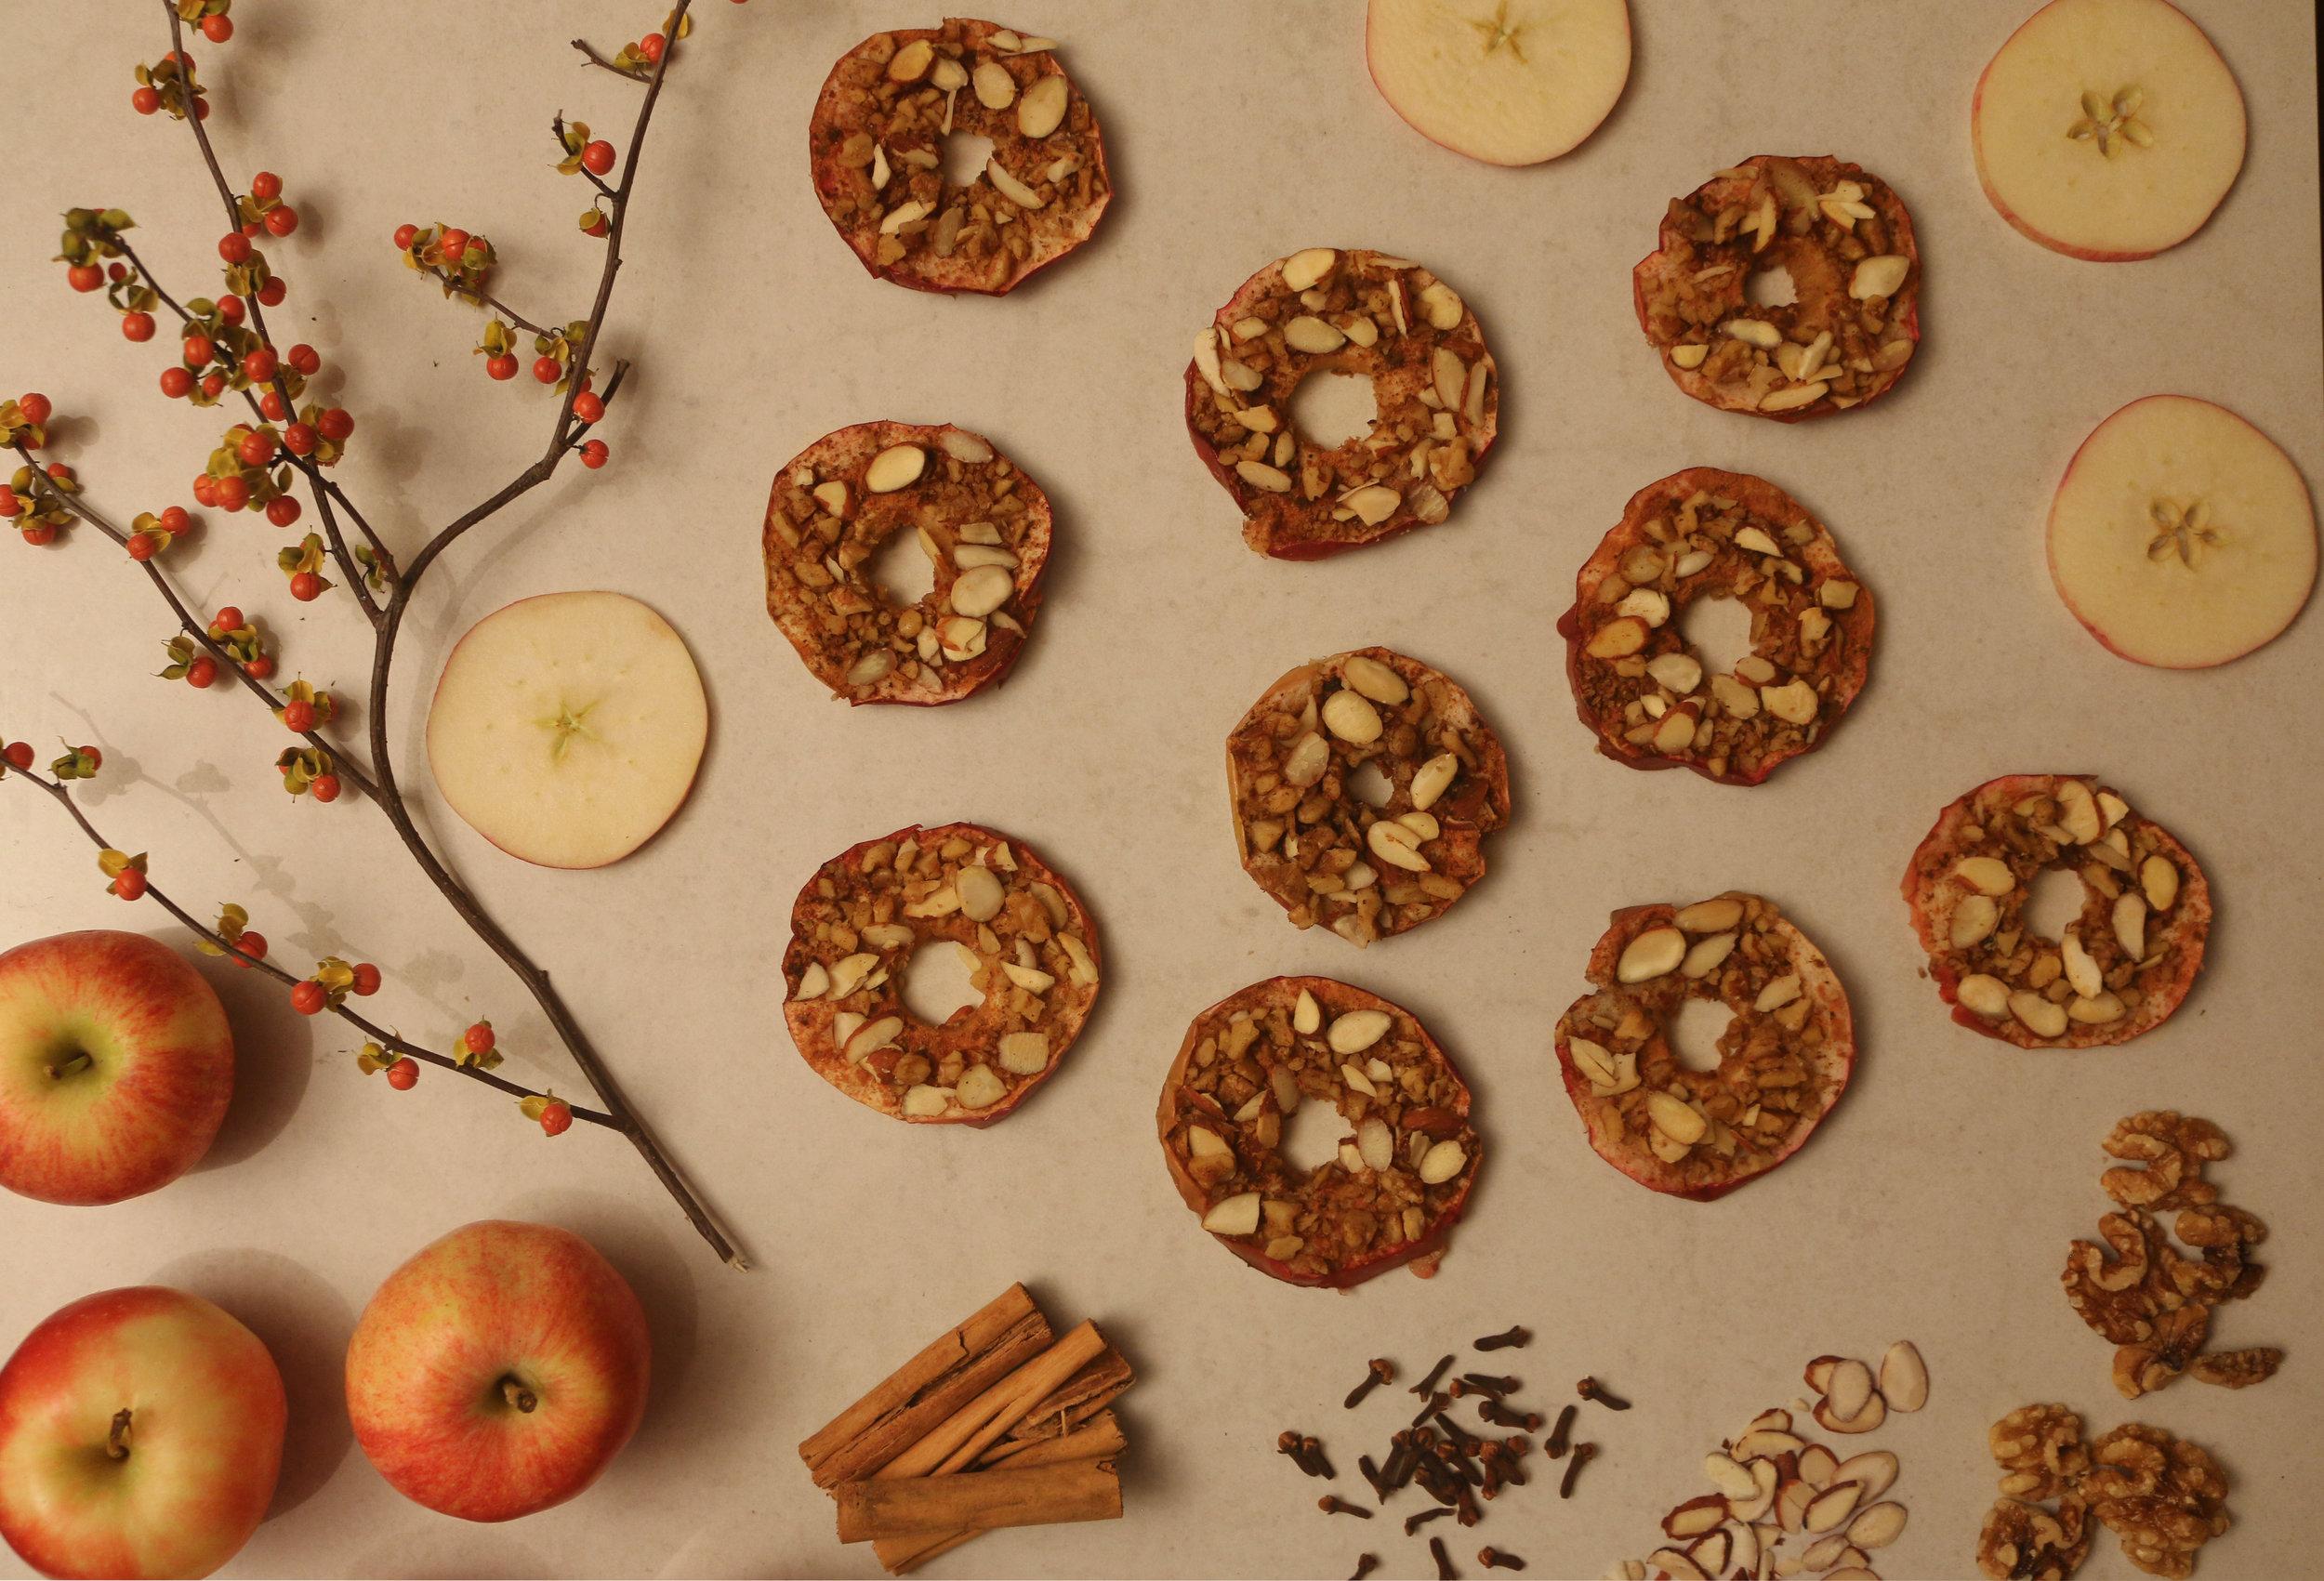 Baked-Apple-Slices-gourmandesante-readersdigest